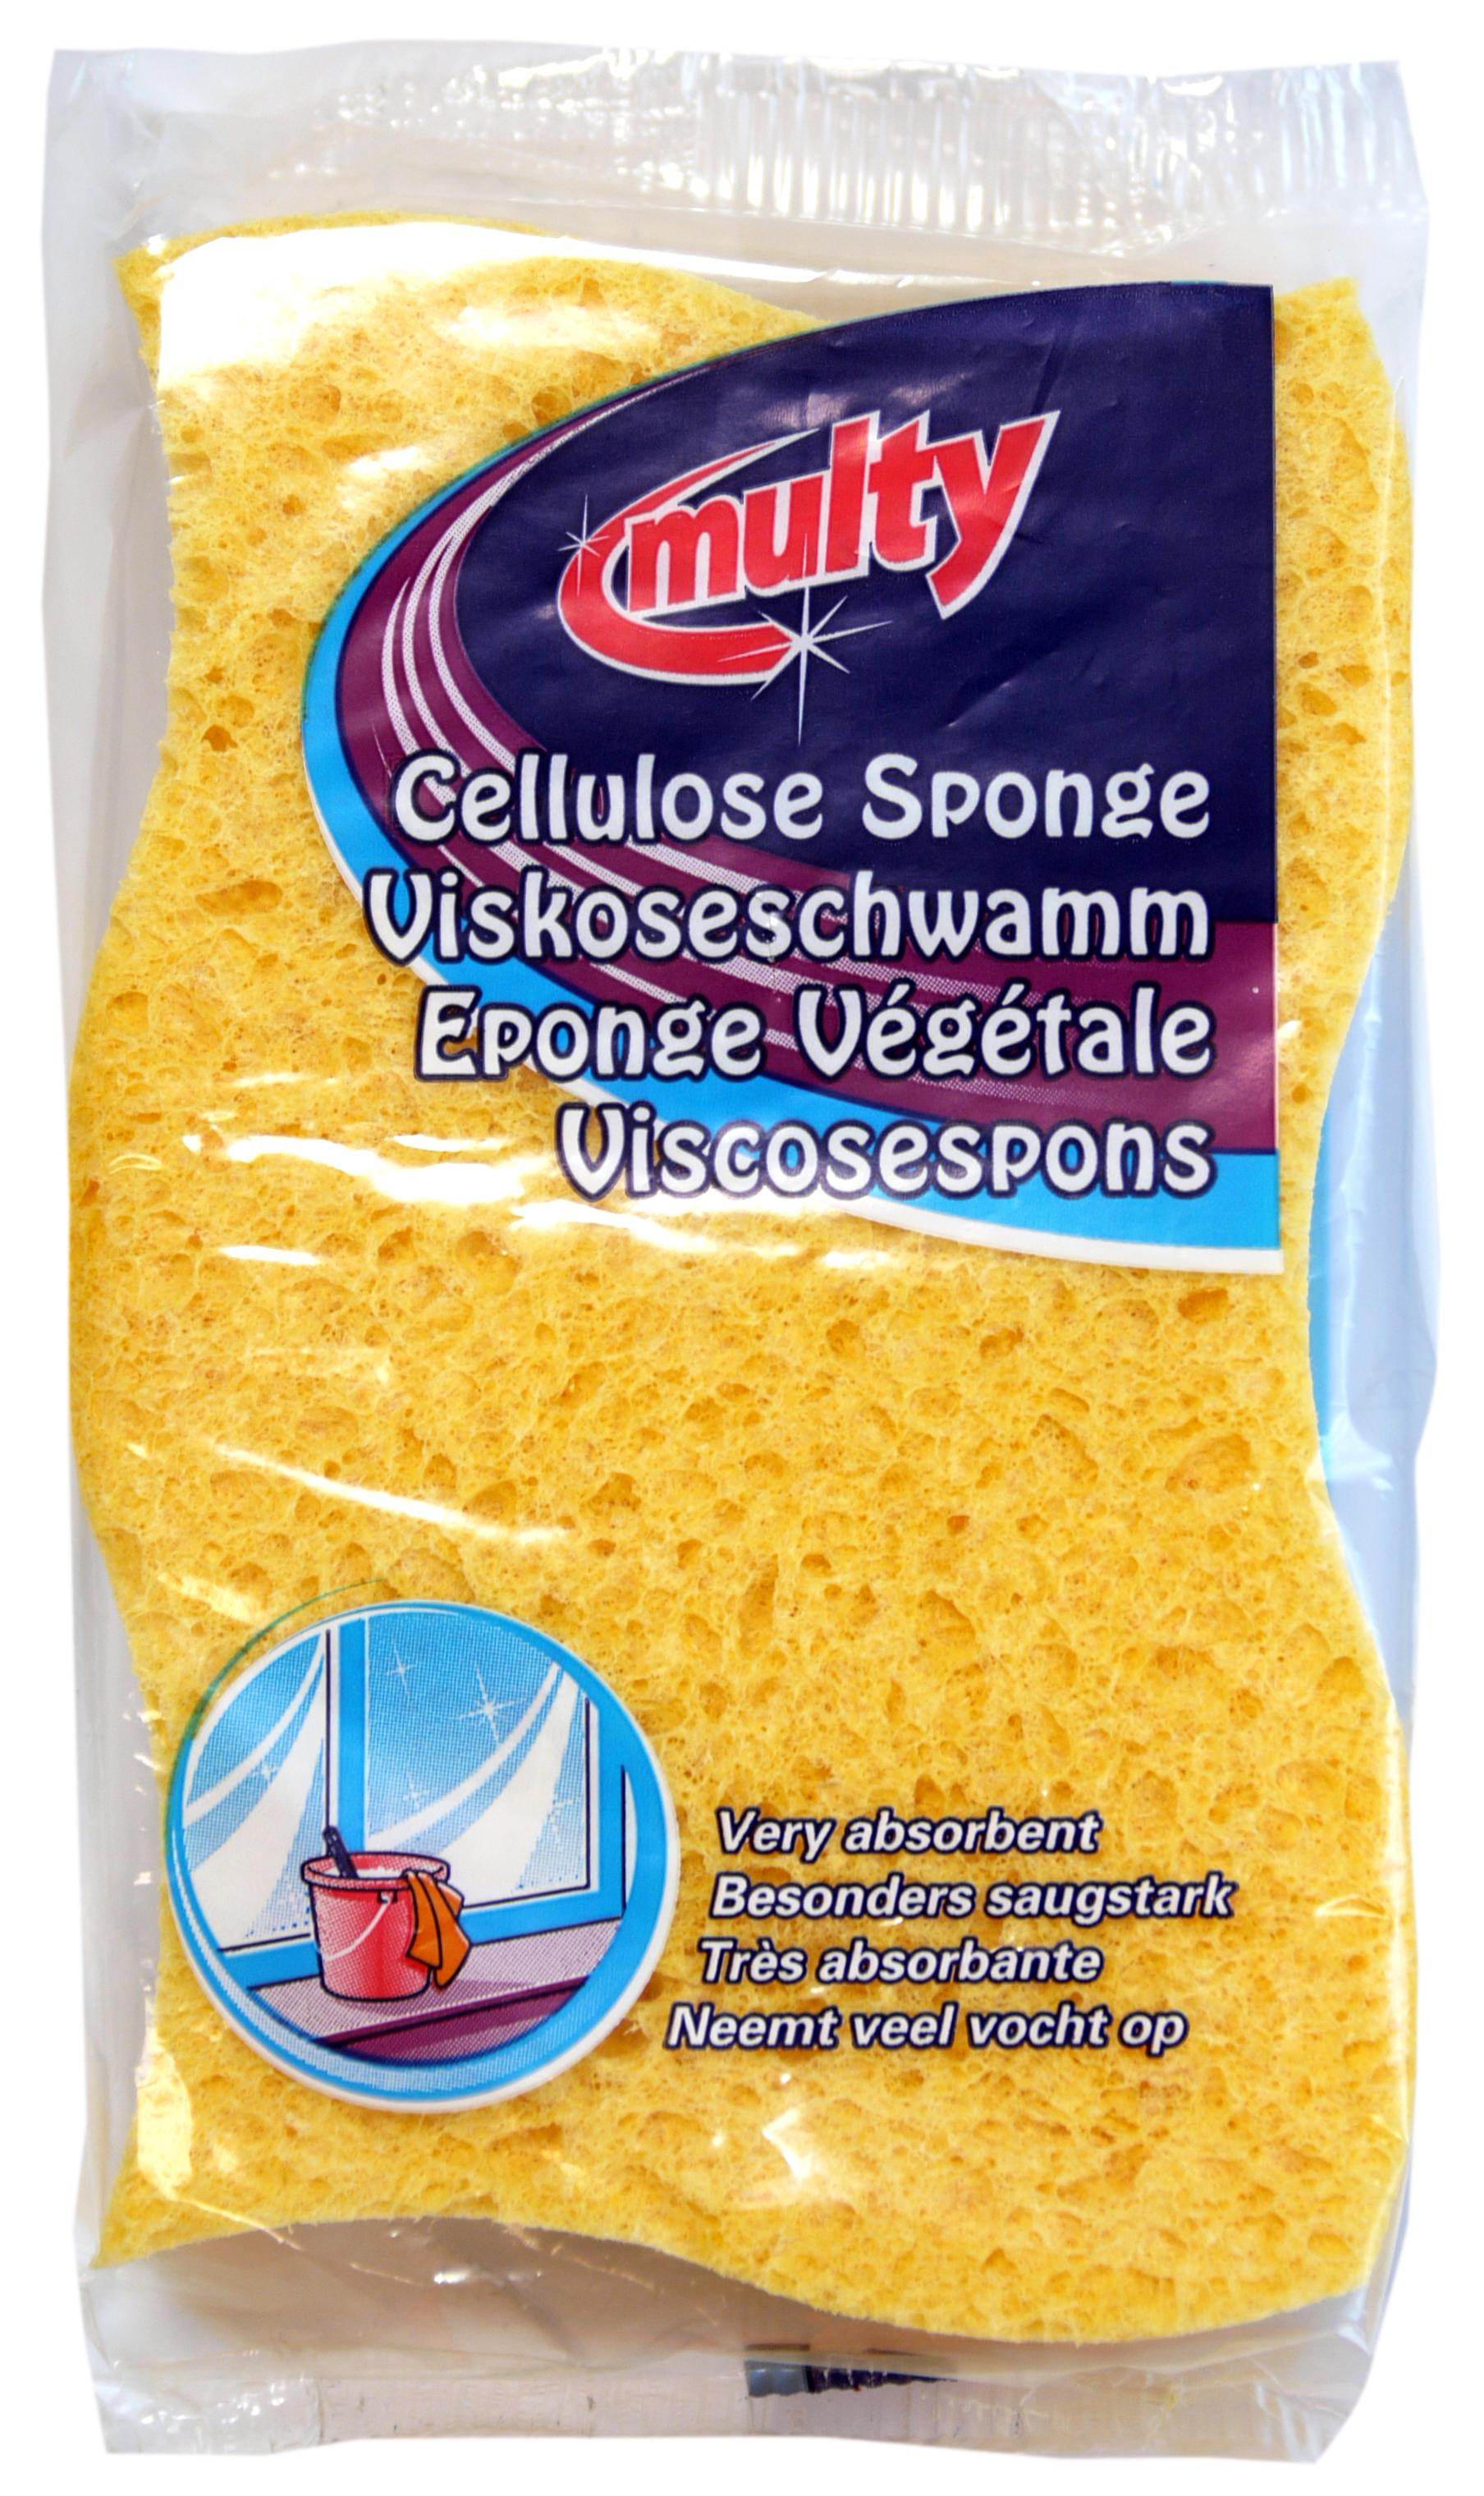 01910 - Cellulose household sponge, ca. 14x9 cm